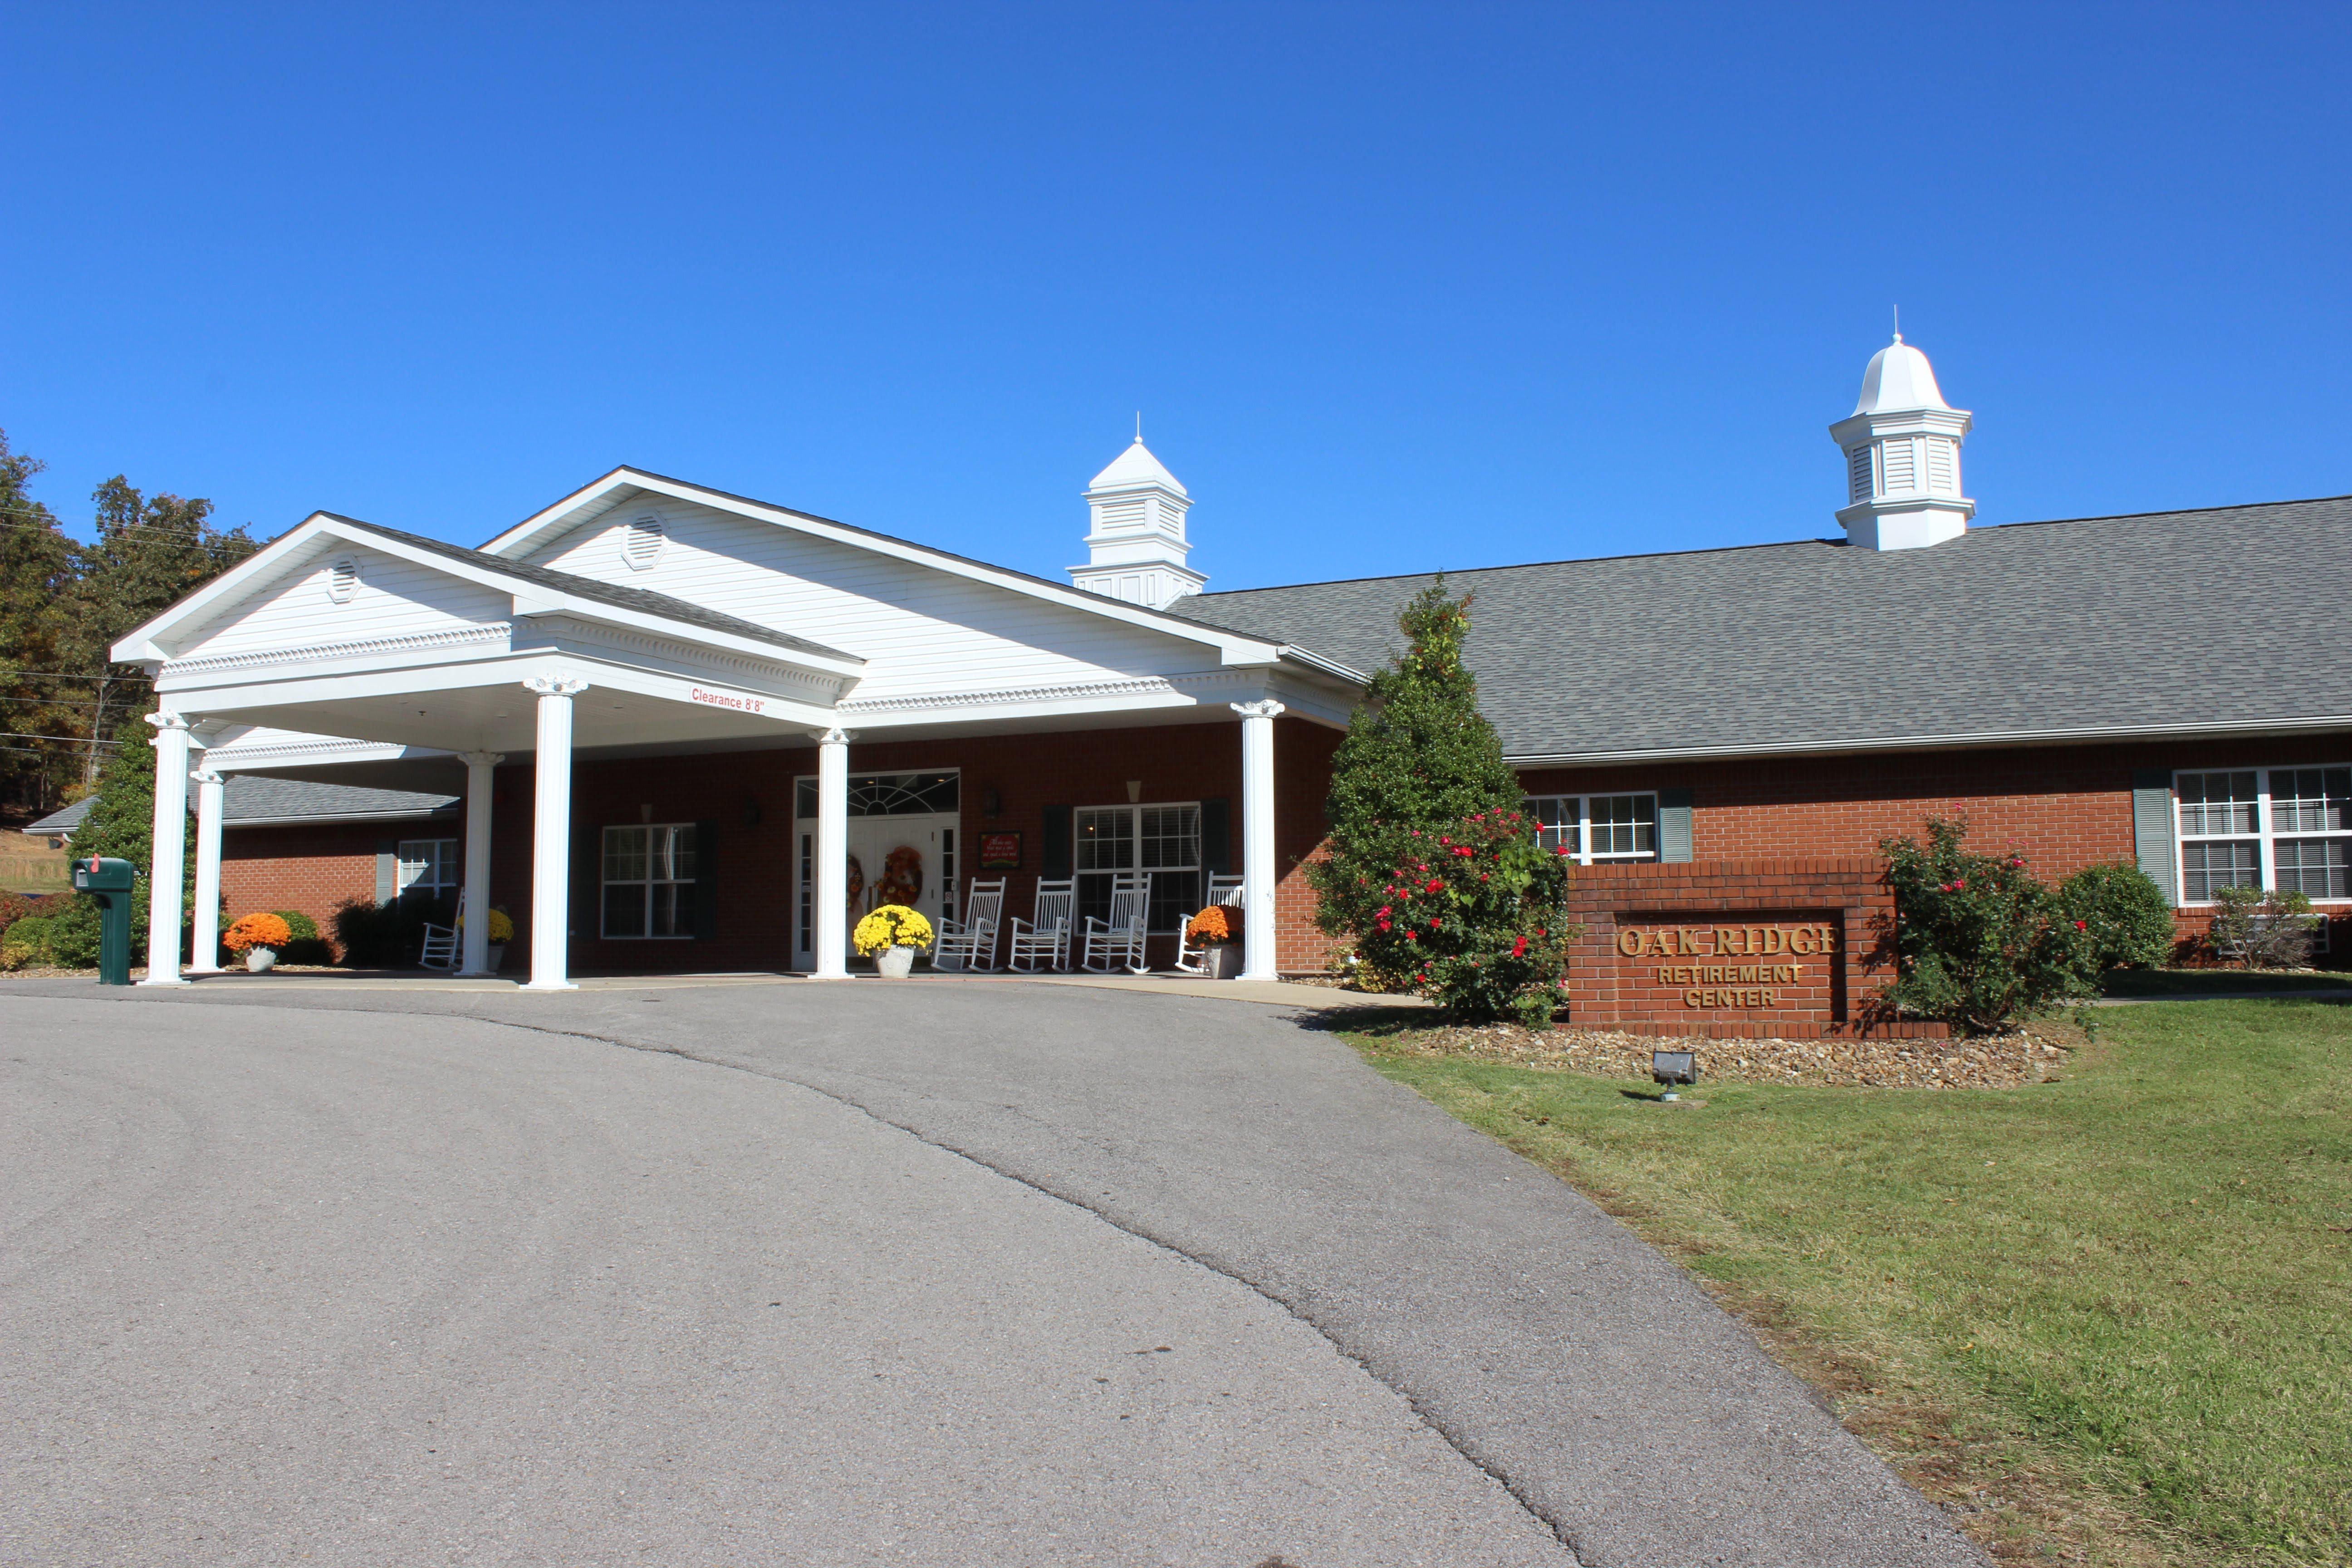 Photo 1 of Oak Ridge Senior Living